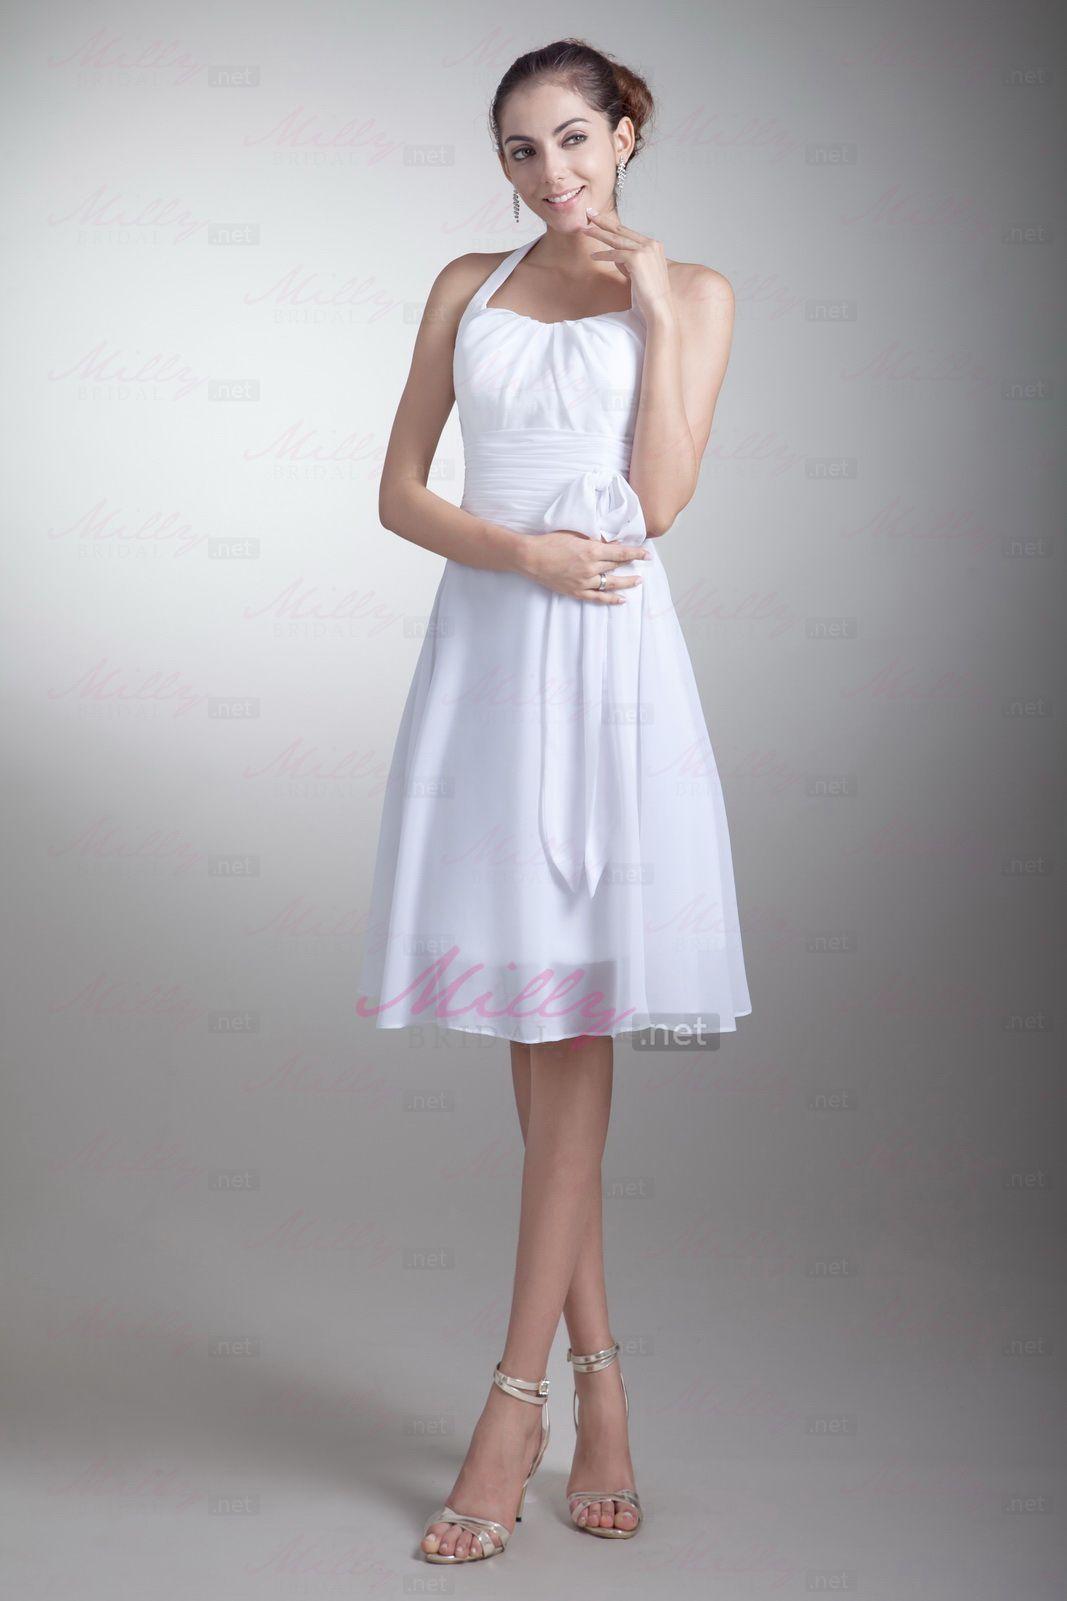 casual wedding dresses knee length - Google Search | Wedding ...